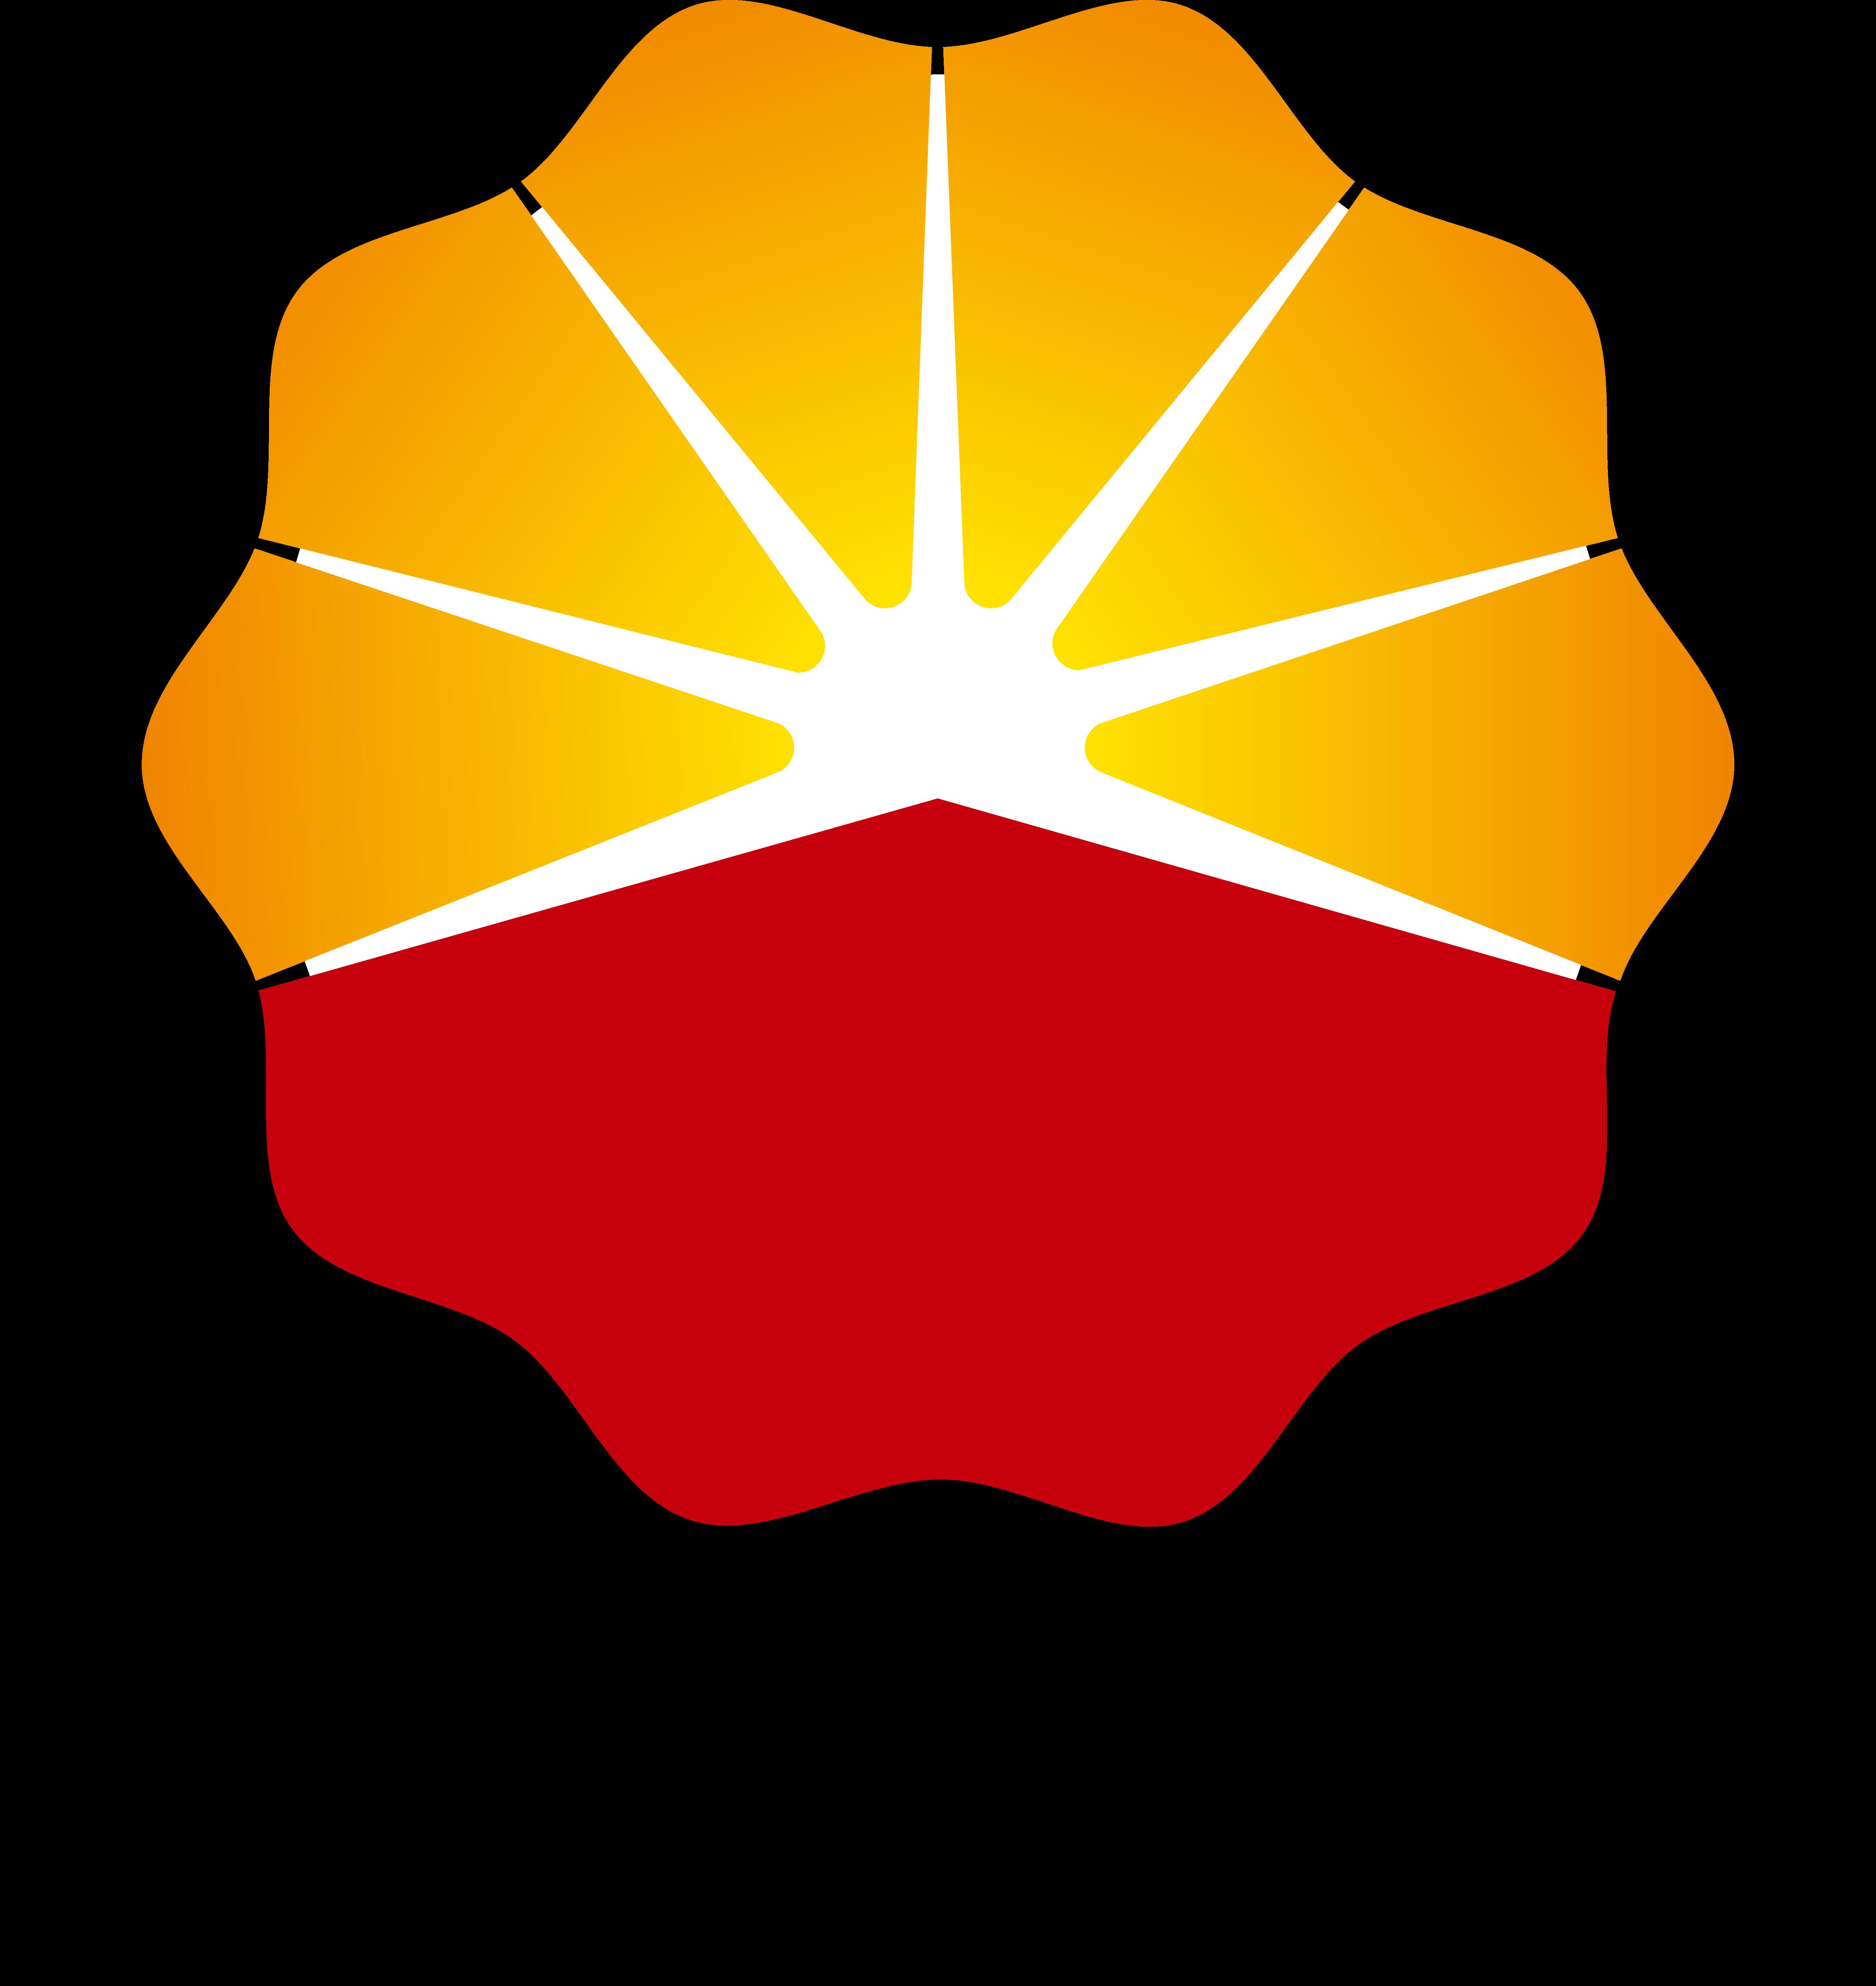 Petrochina logo, logotype, emblem